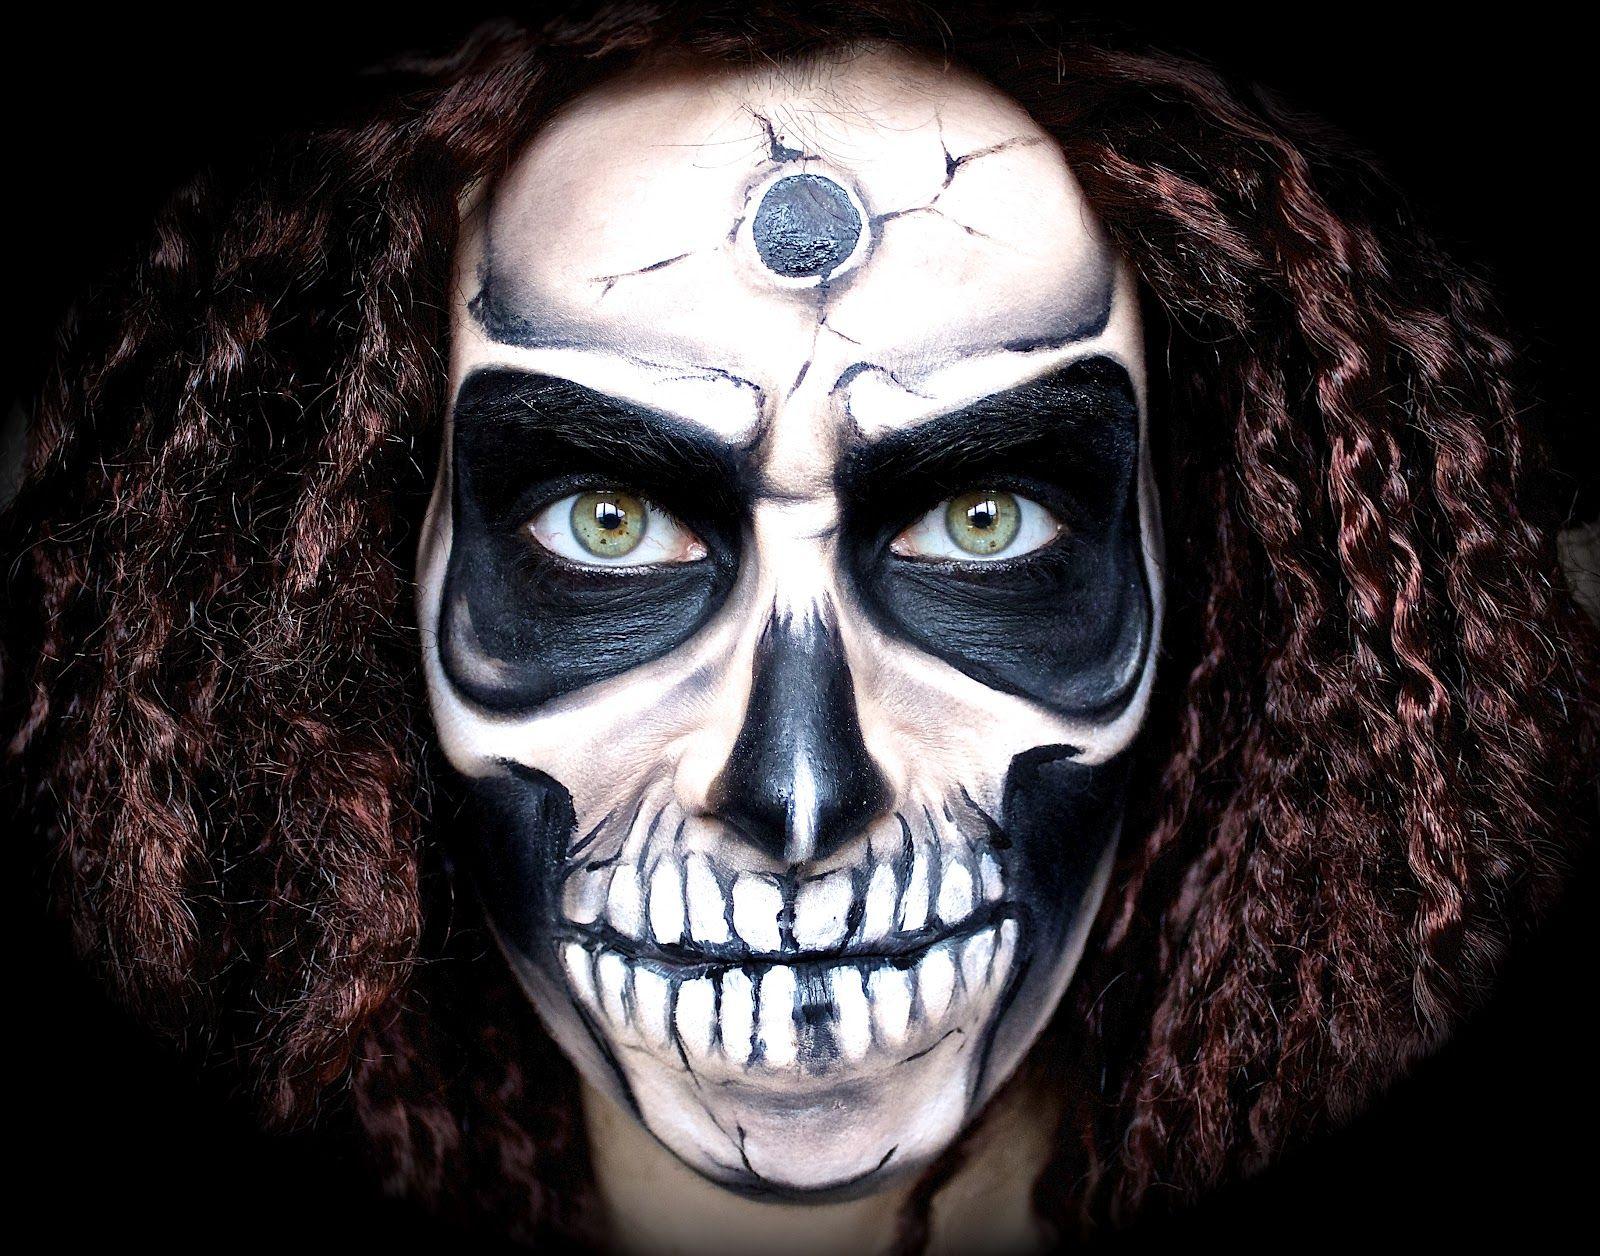 Scary/Creepy Skull Makeup Tutorial; Halloween '12